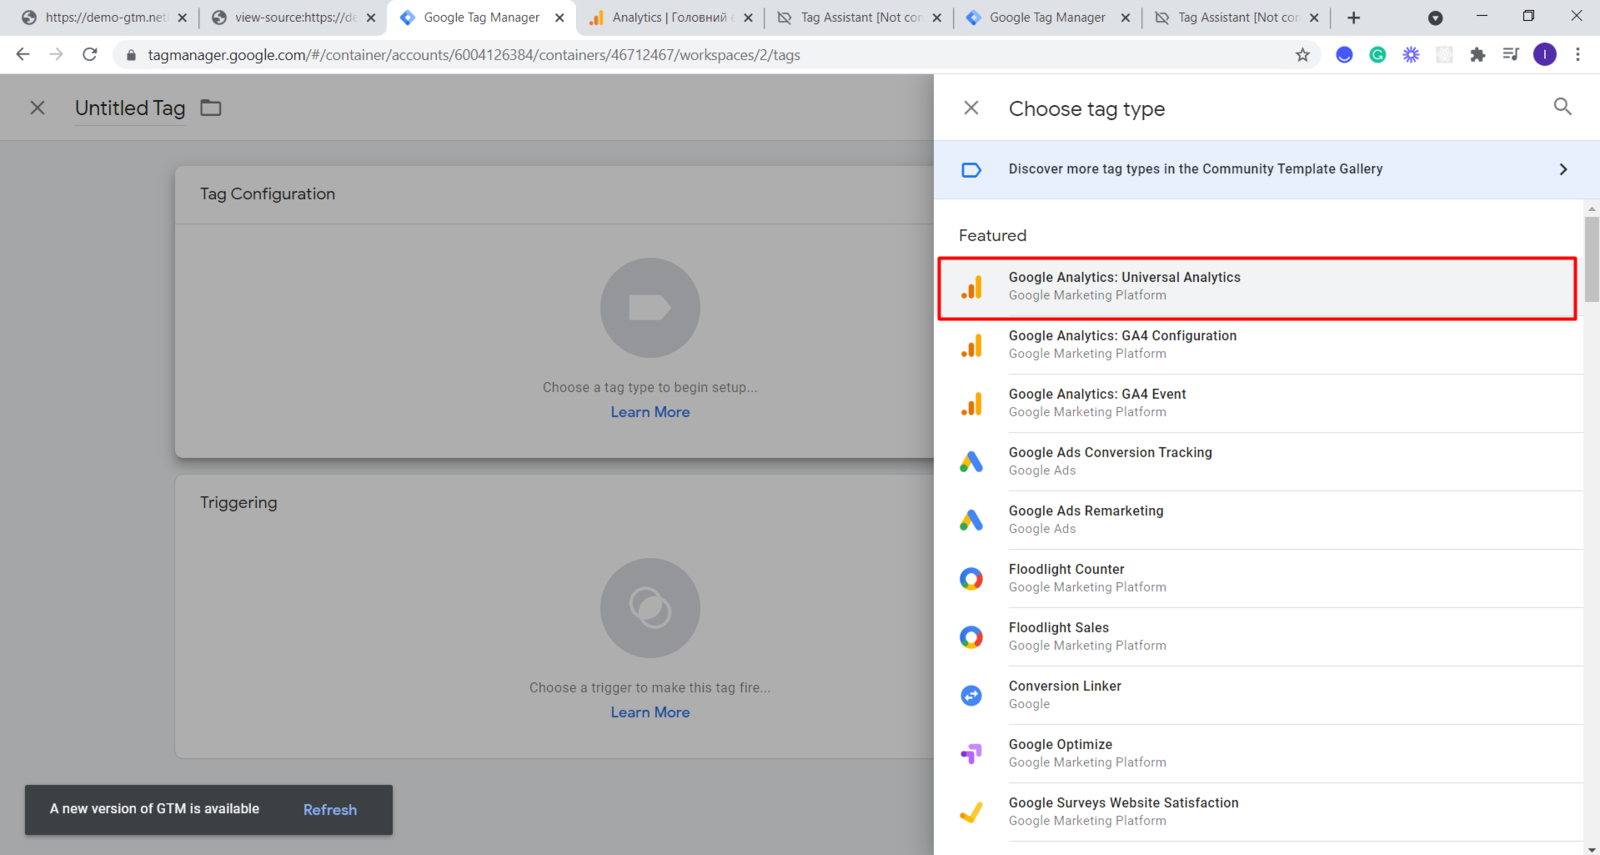 Tags => New => Choose a tag type...=> Google Analytics: Universal Analytics